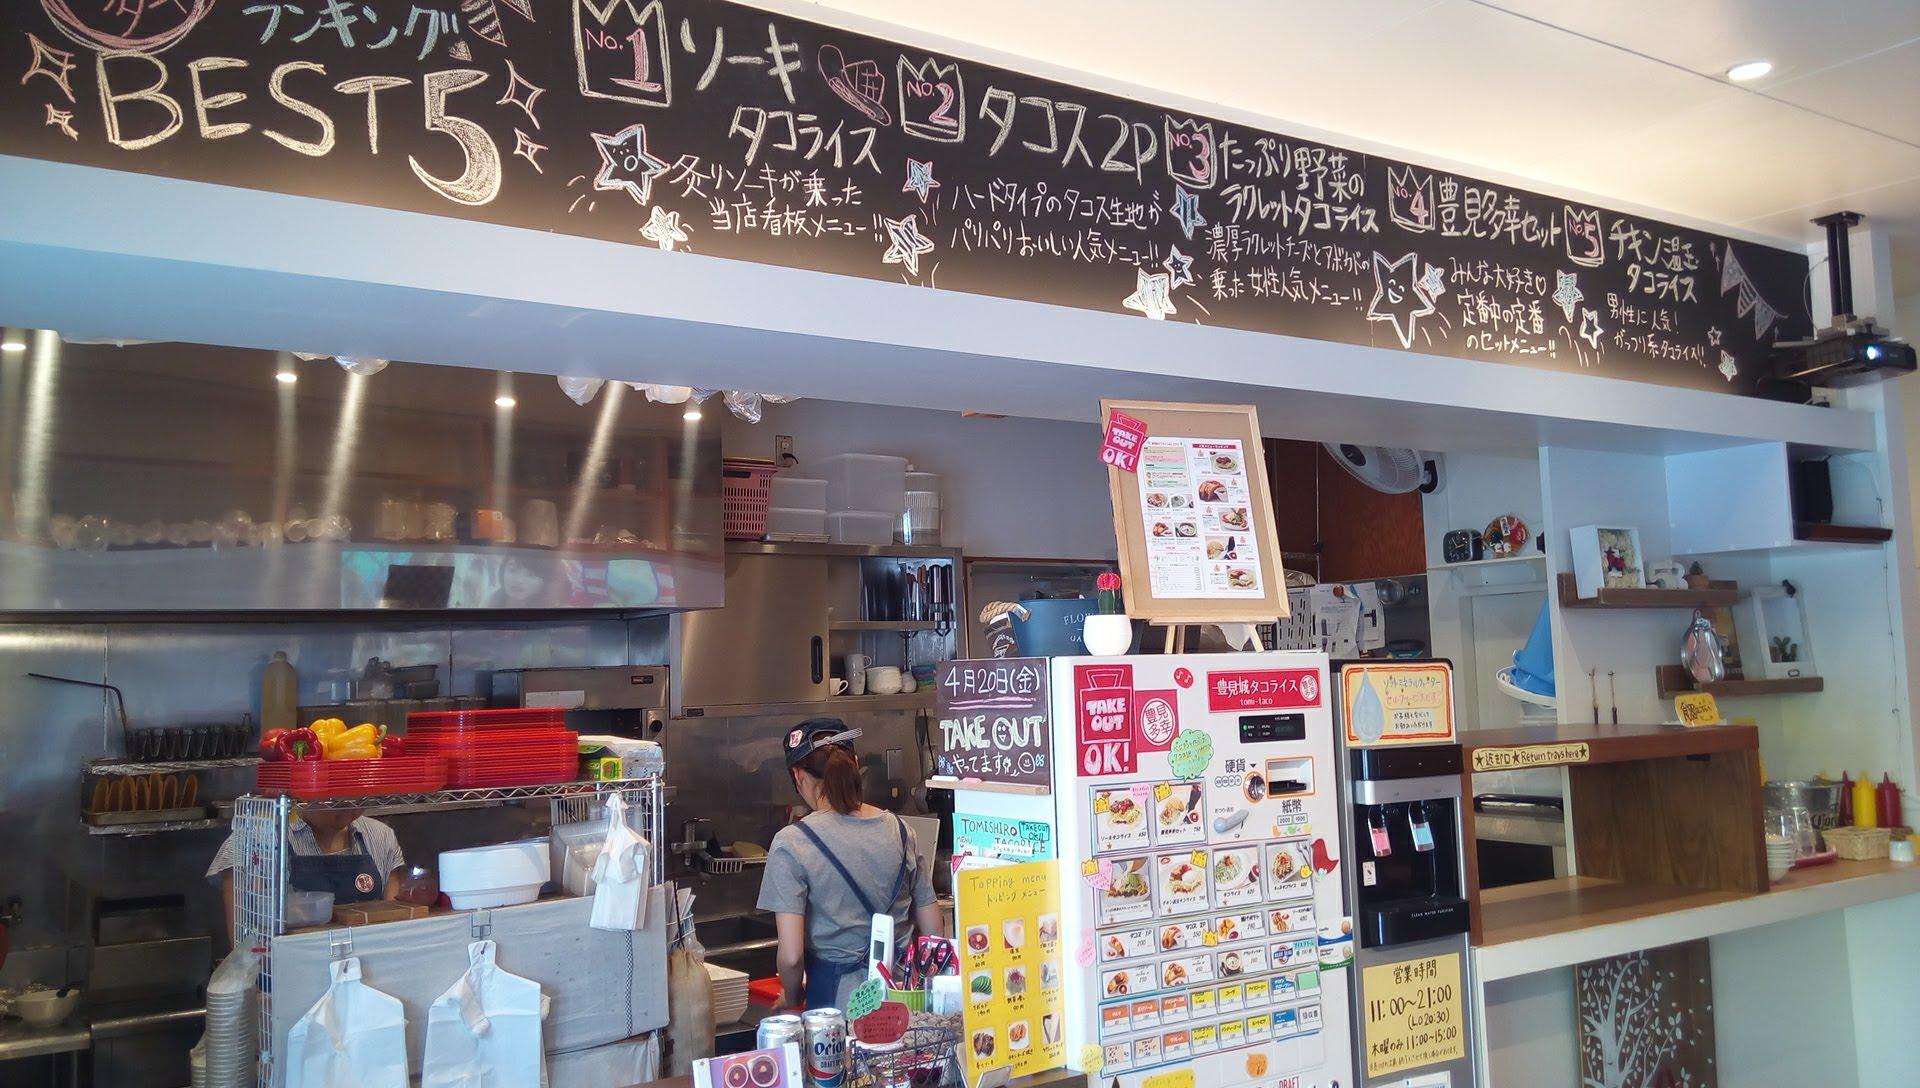 The interior of Tomishiro Taco Rice 1